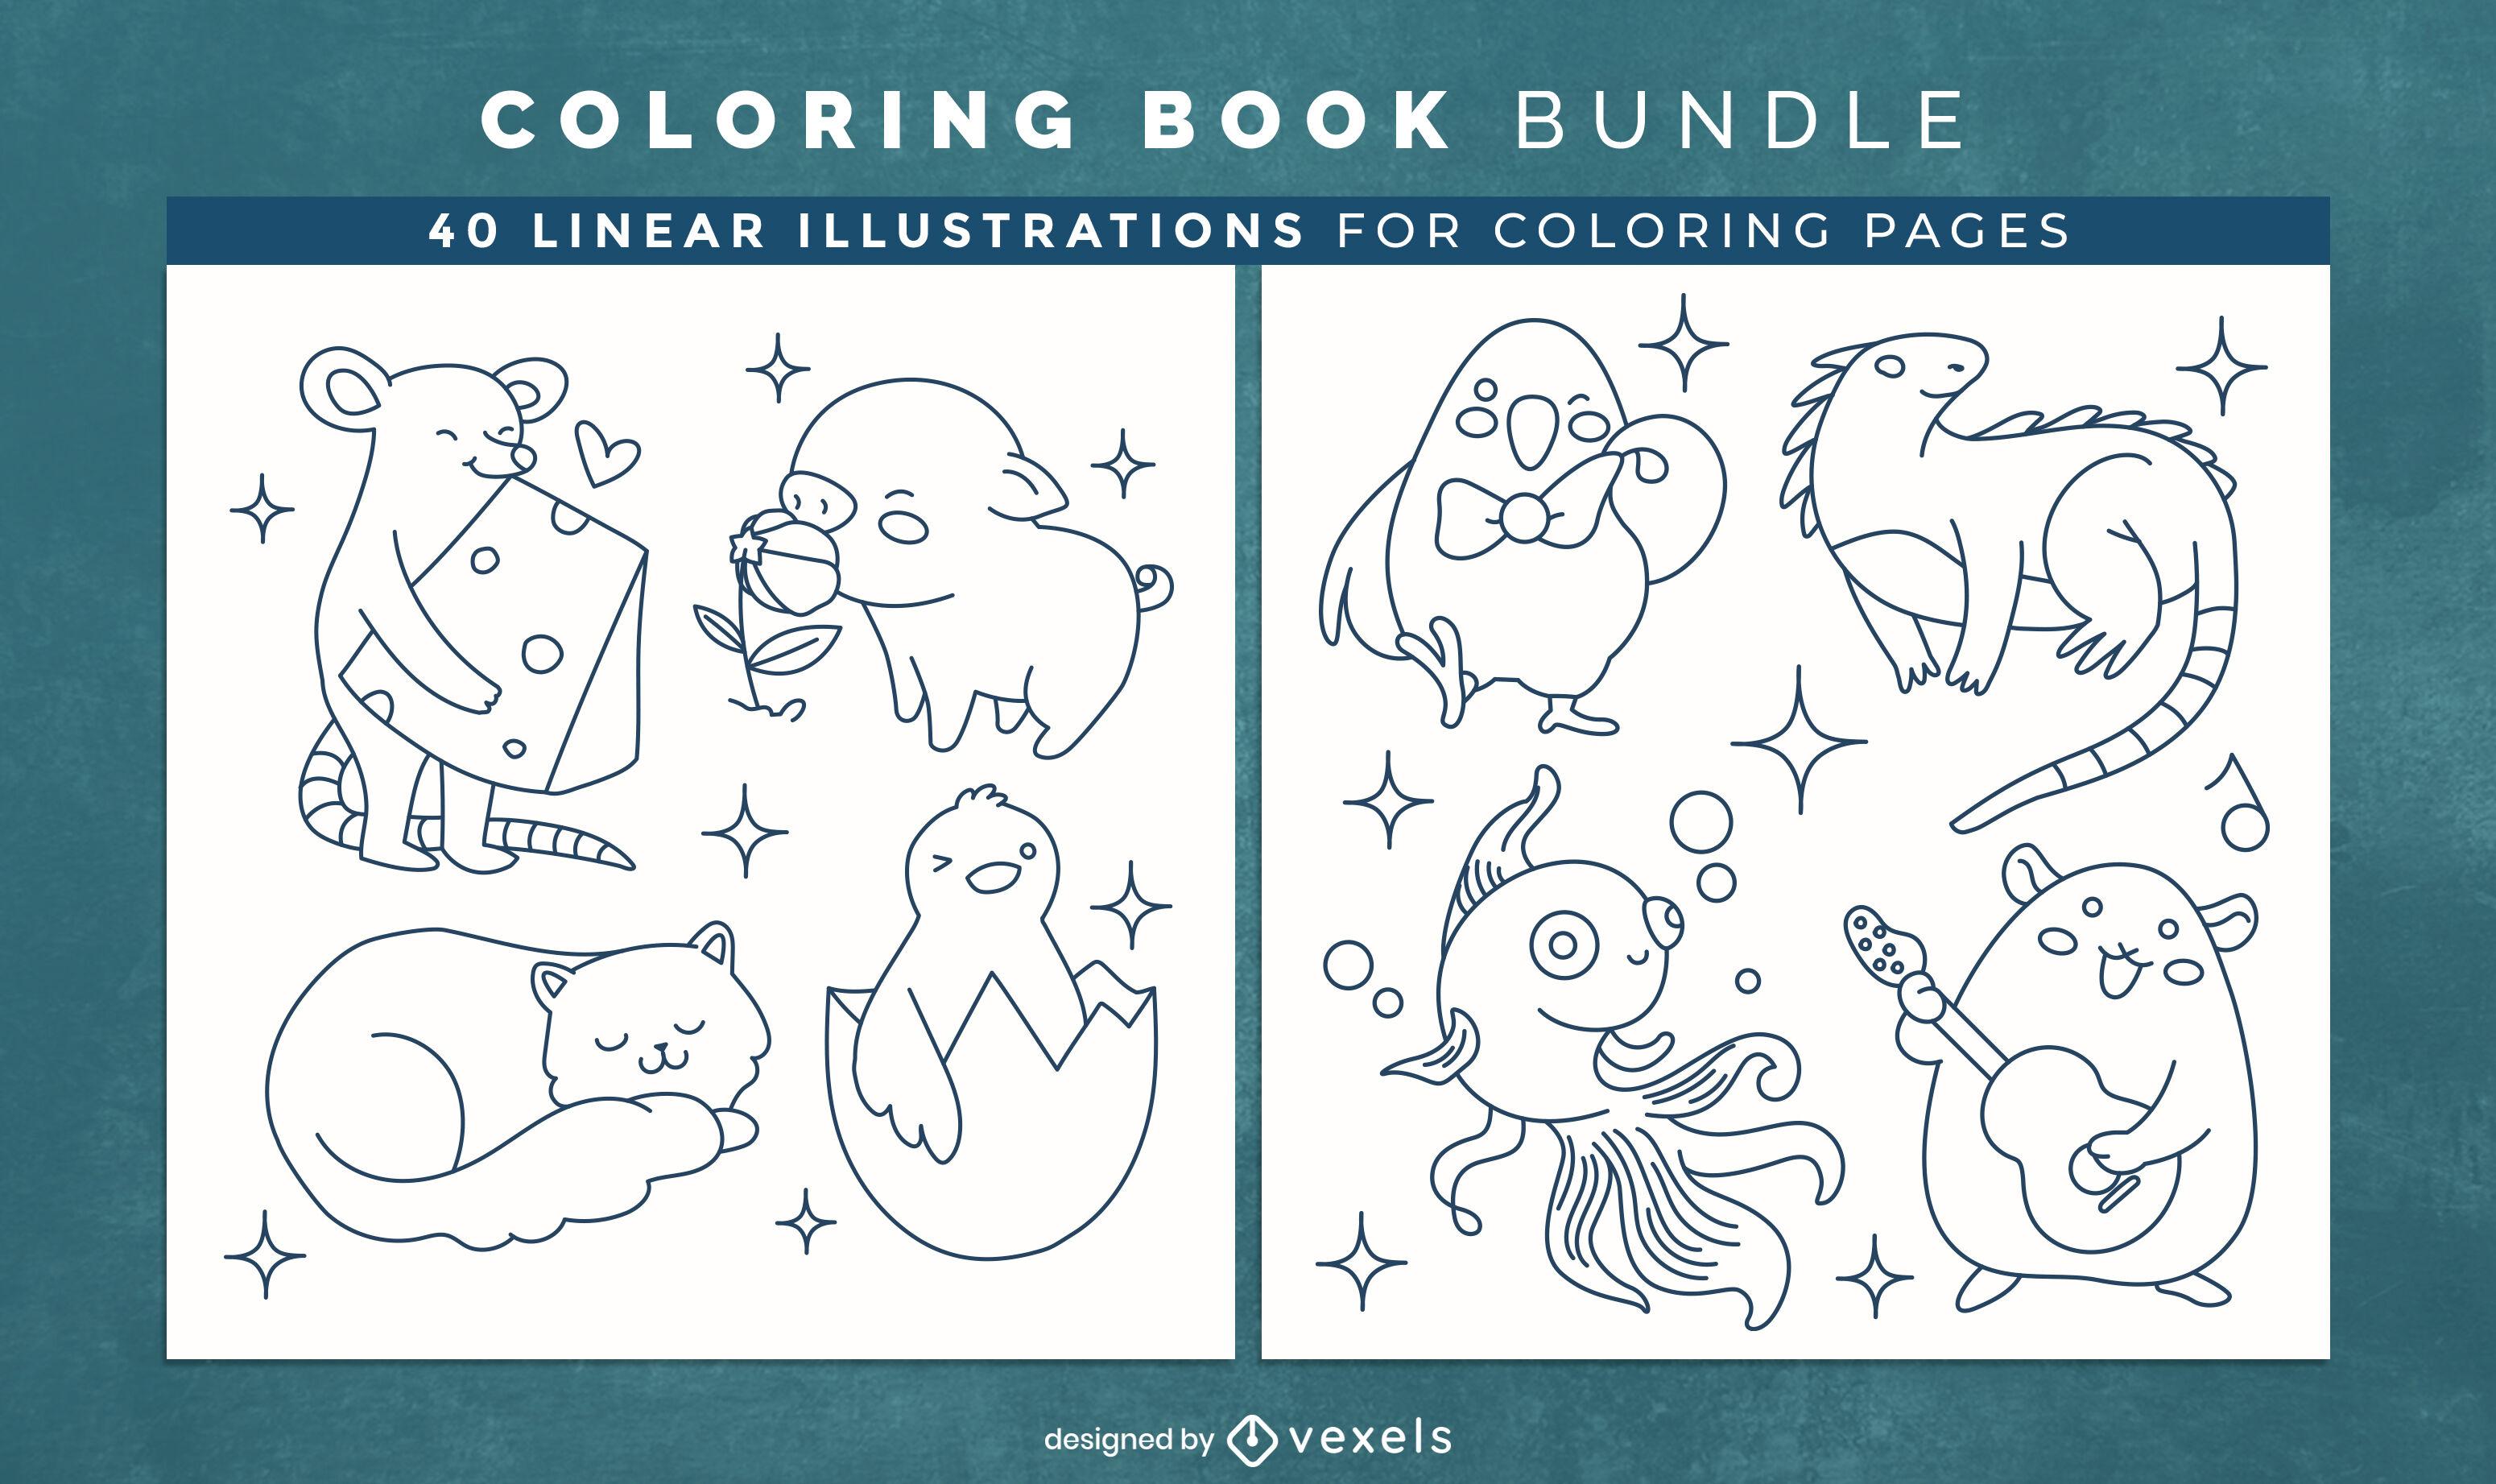 Dise?o de interiores de libro para colorear de animales beb?s